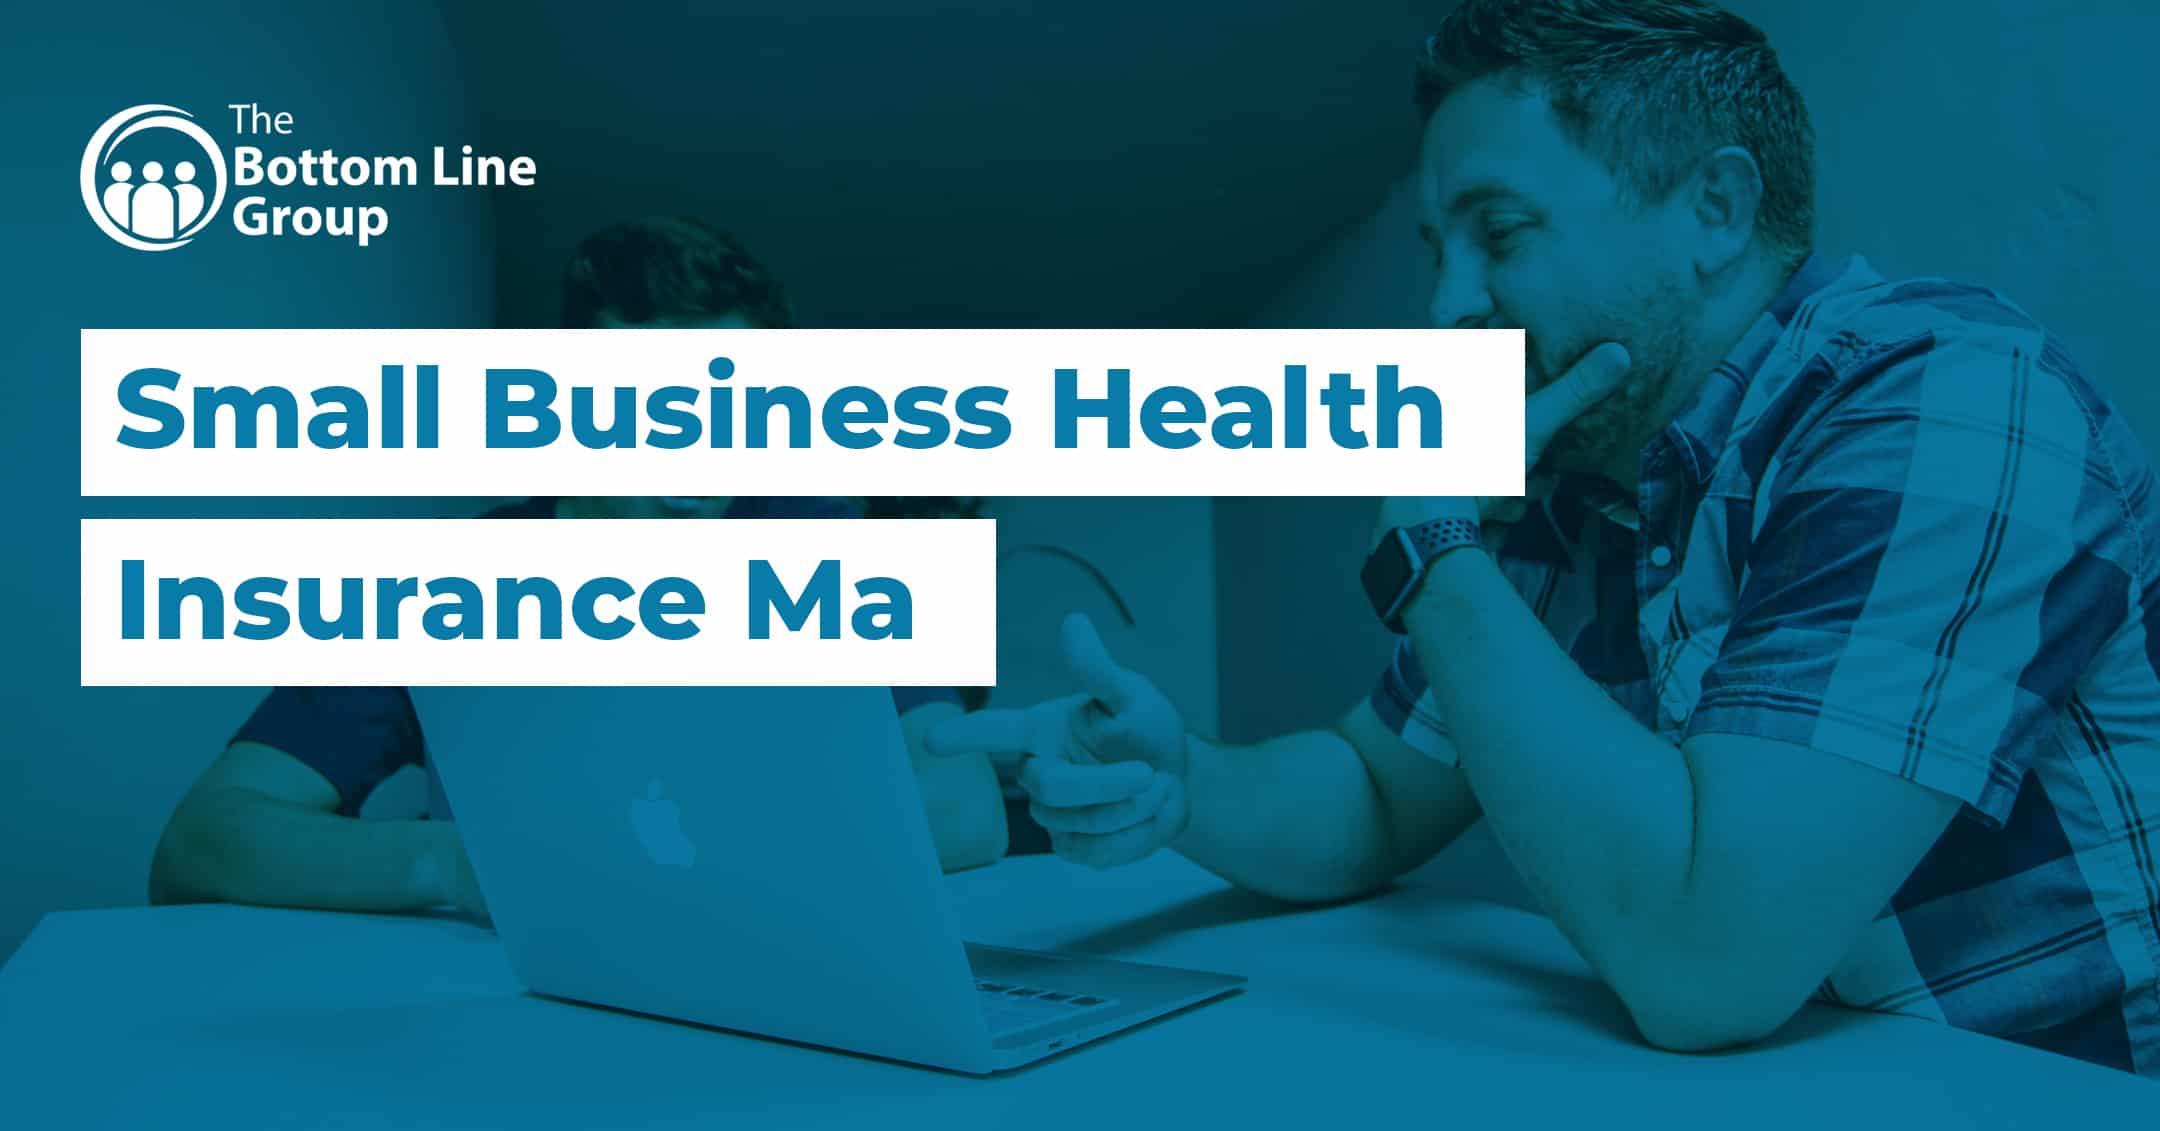 53-(Small-Business-Health-Insurance-Ma)1